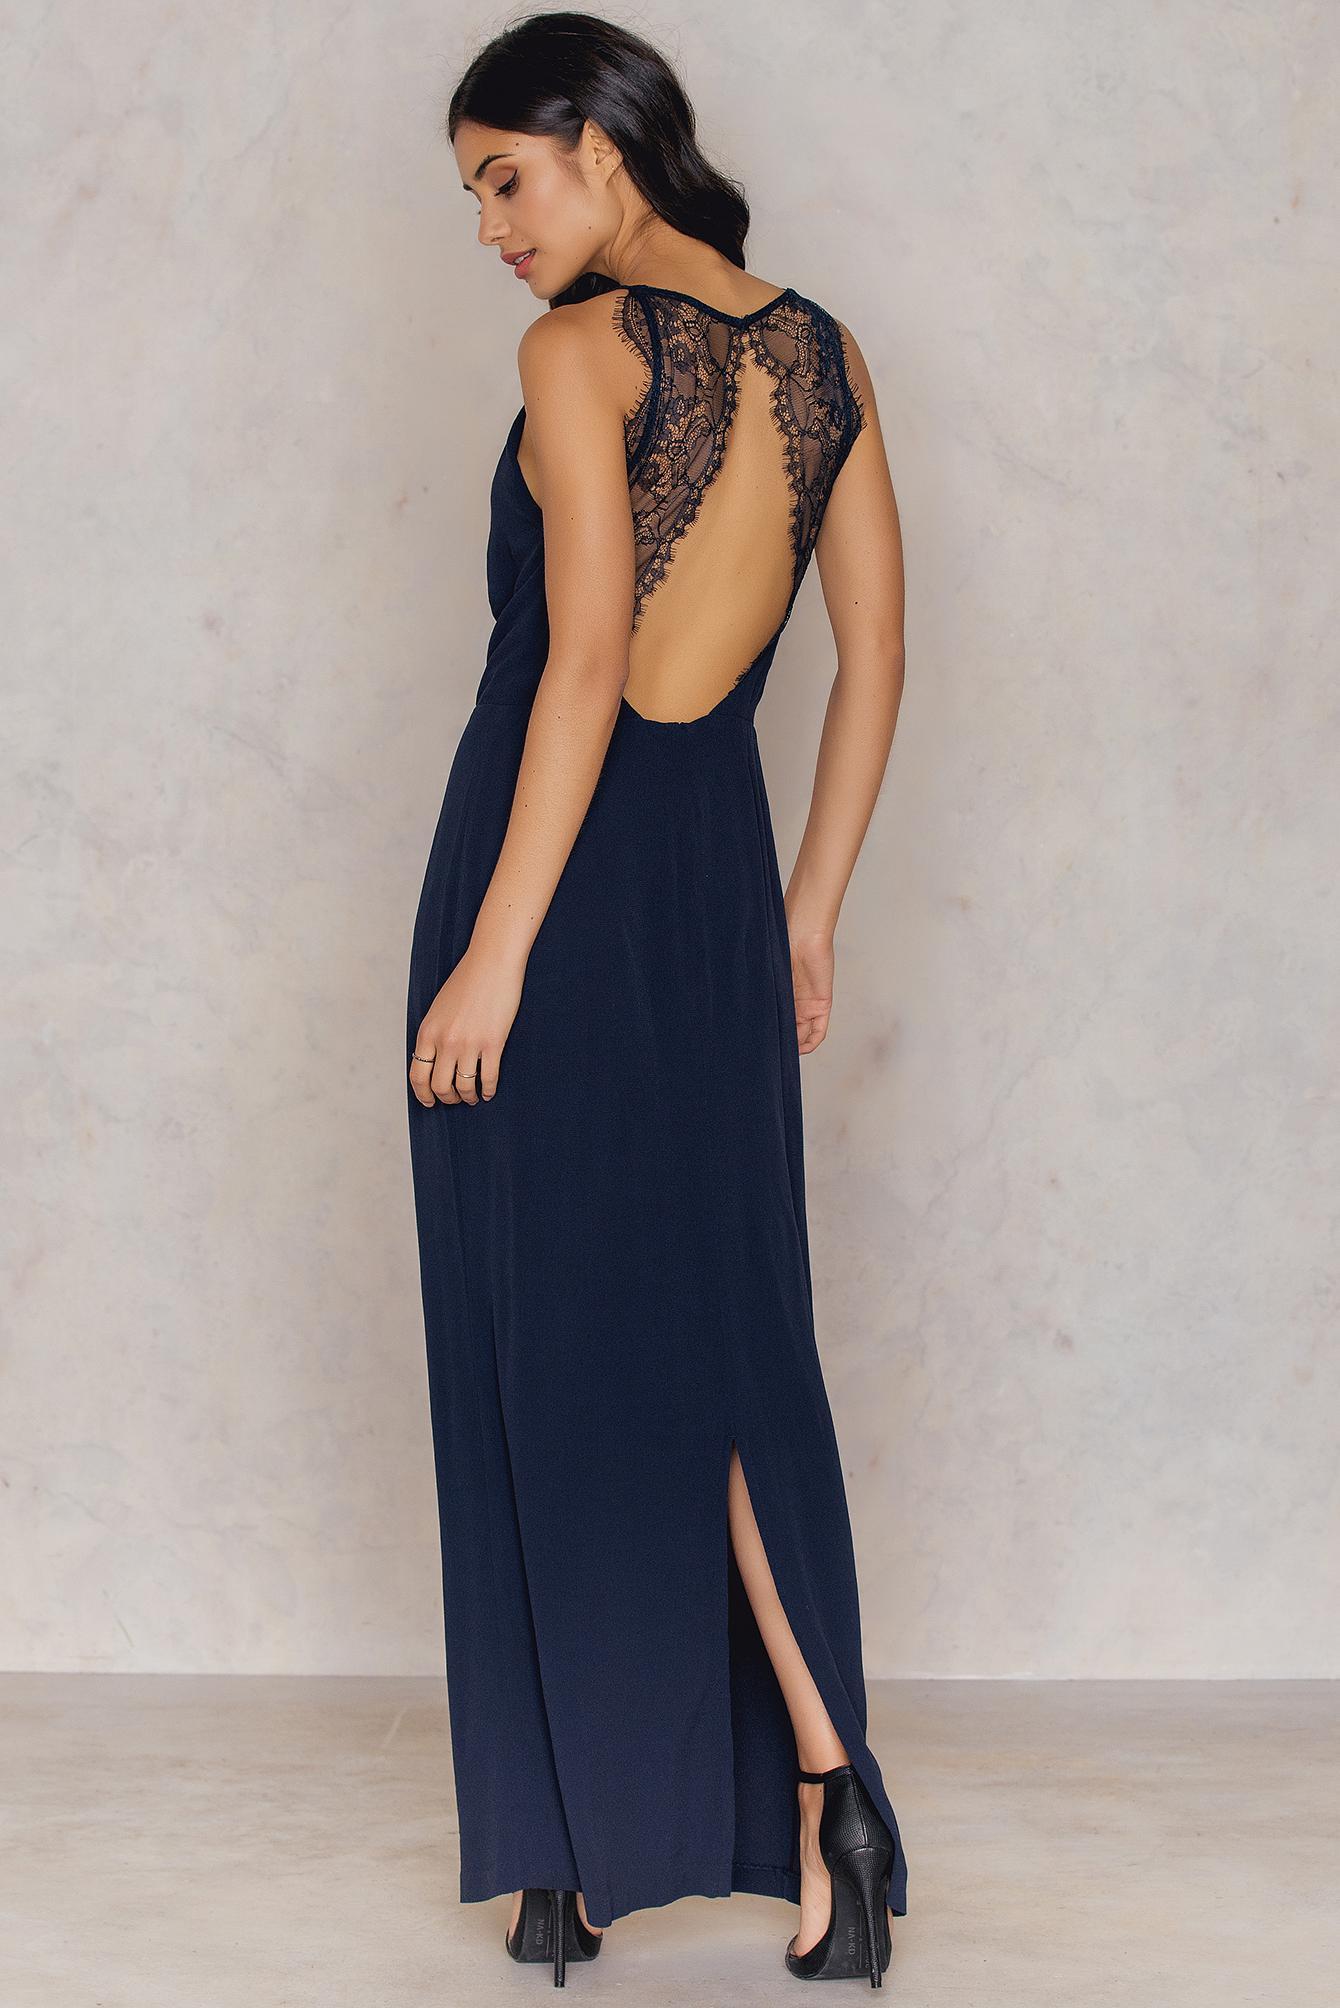 Lyst - Samsøe & Samsøe Willow Dress Long Total Eclipse in Blue